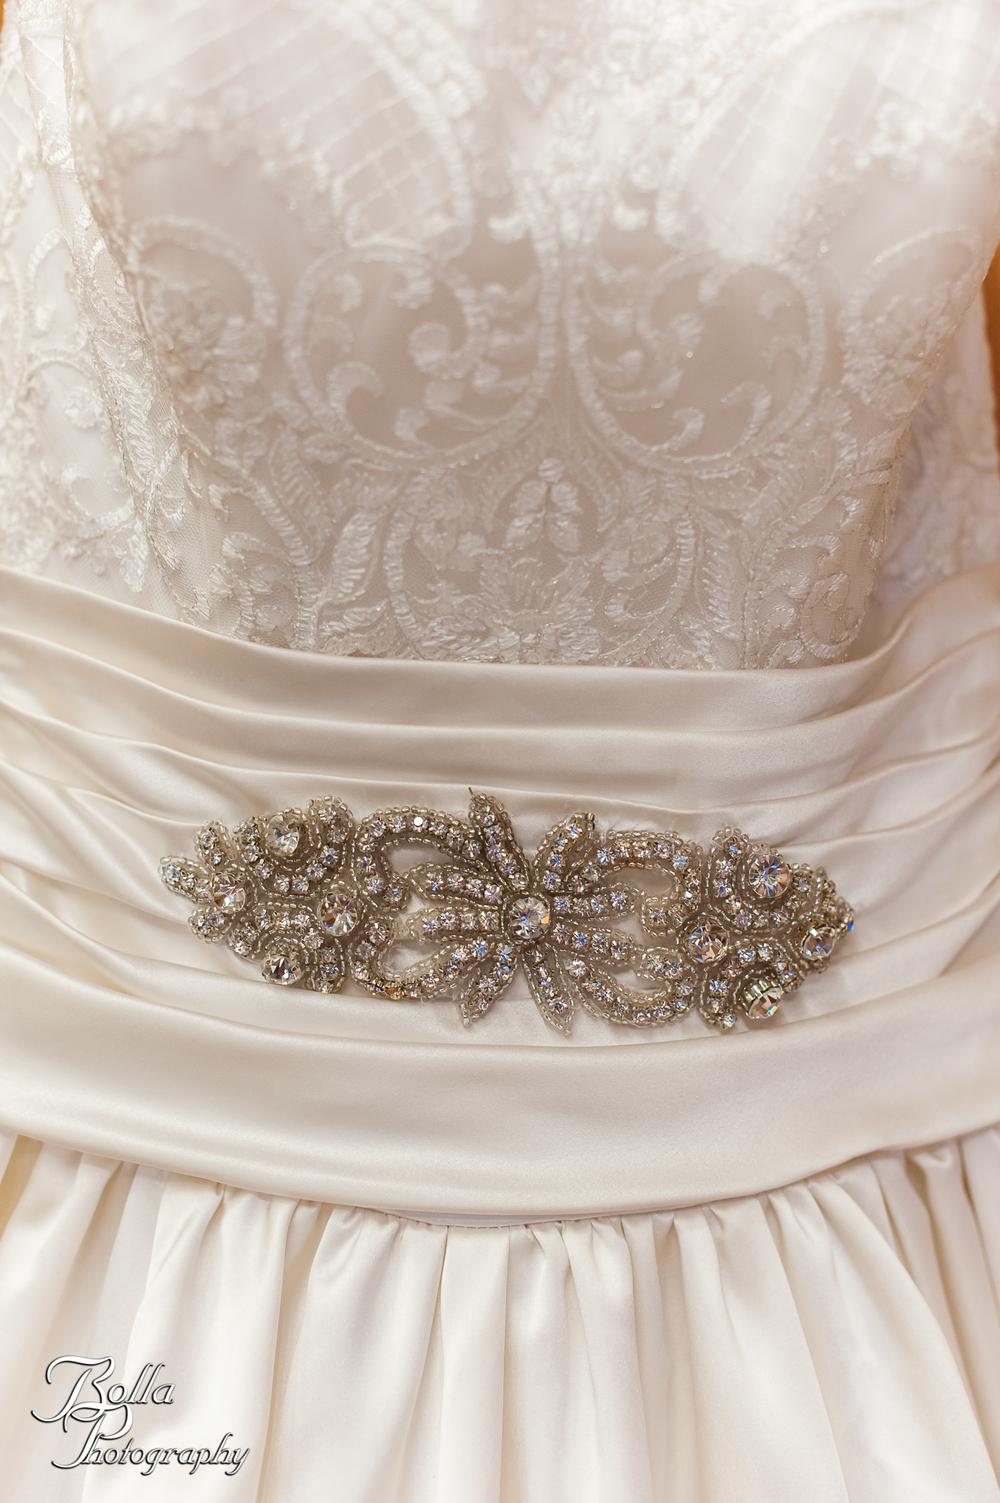 Bolla_Photography_St_Louis_wedding_photographer-0025.jpg